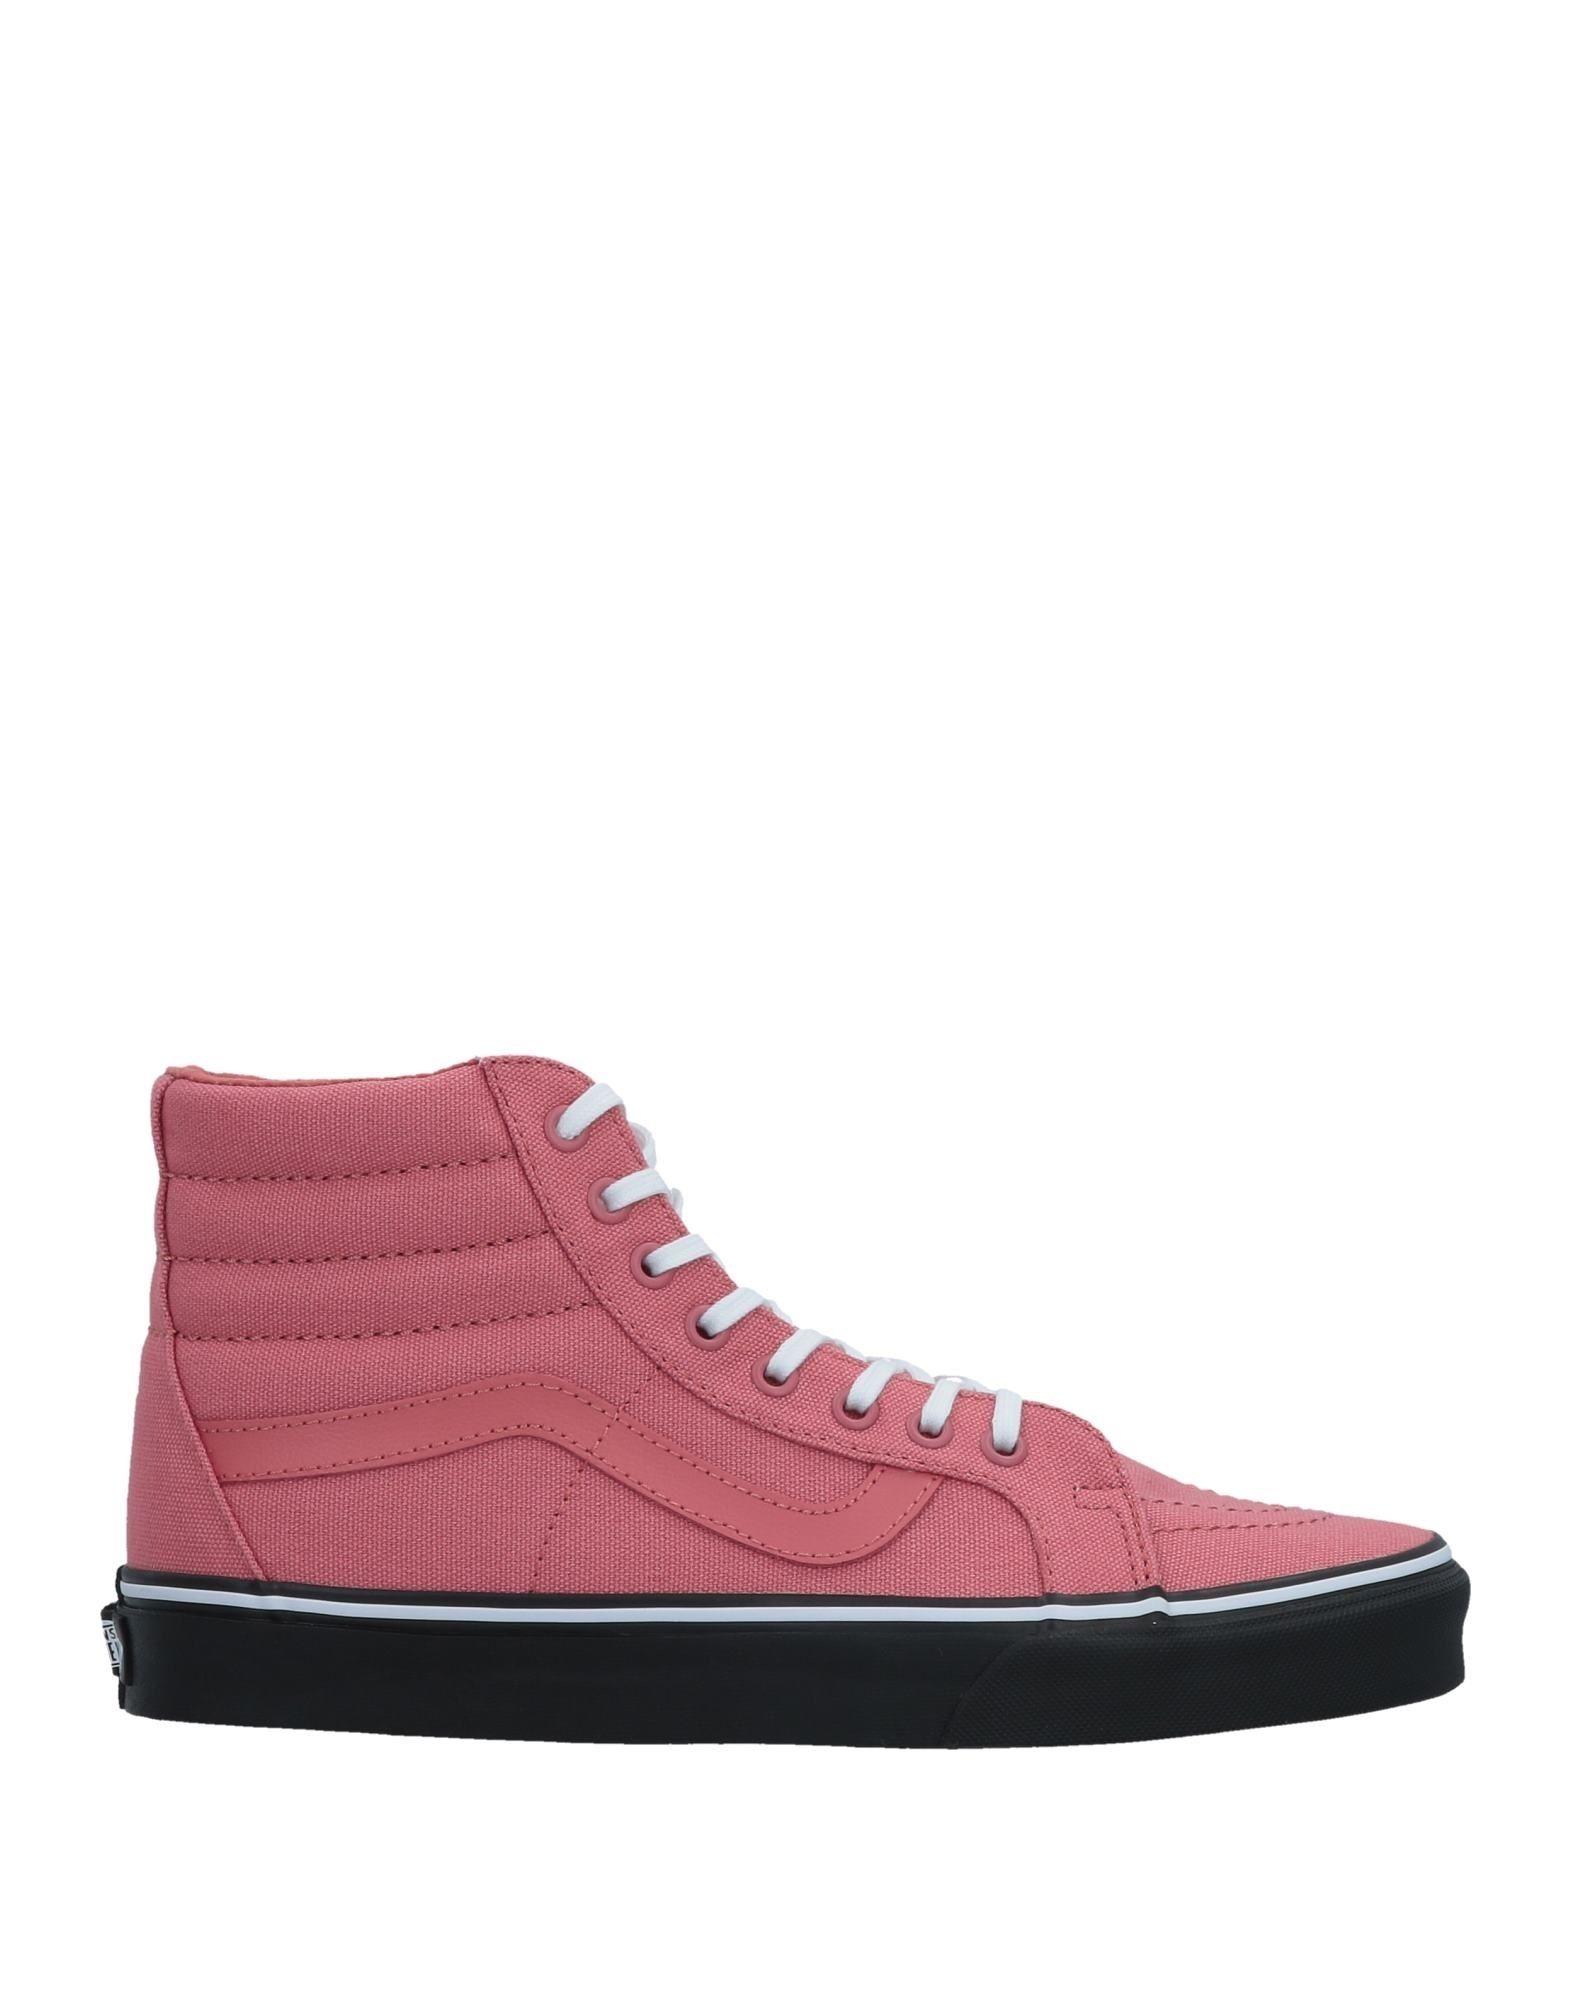 Moda Sneakers Vans Uomo - 11508741SG